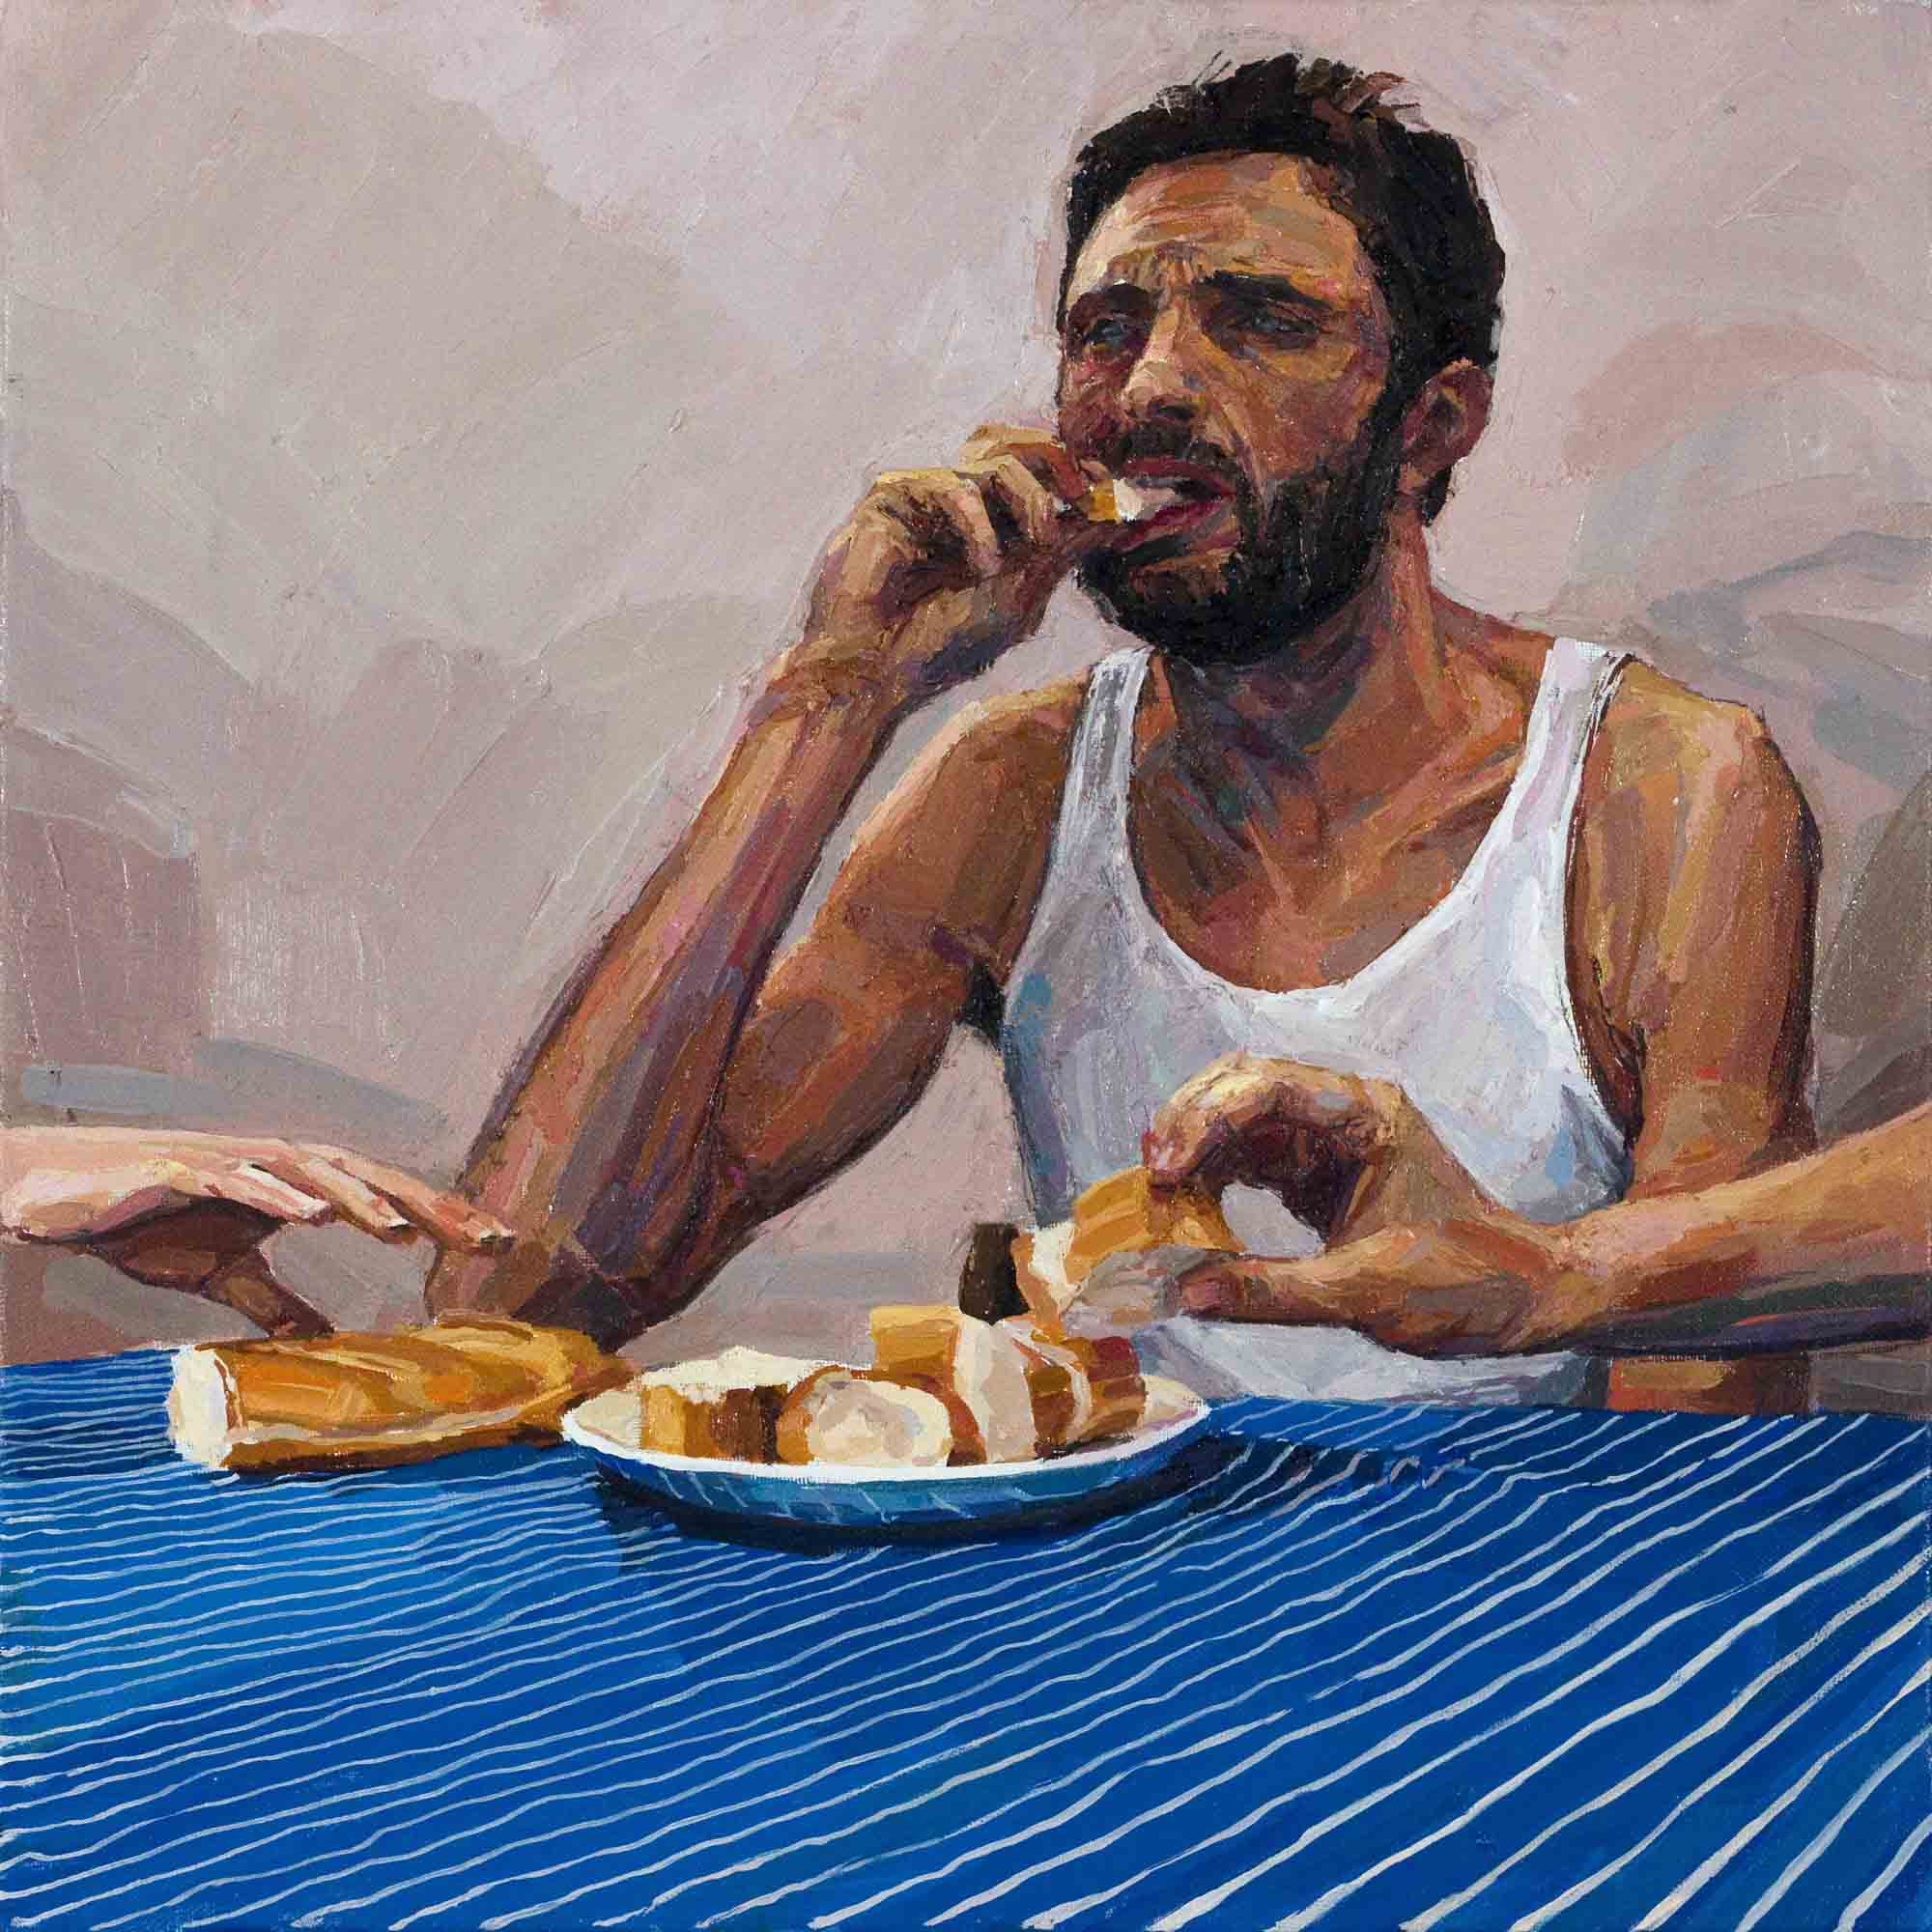 Ladrones de pan